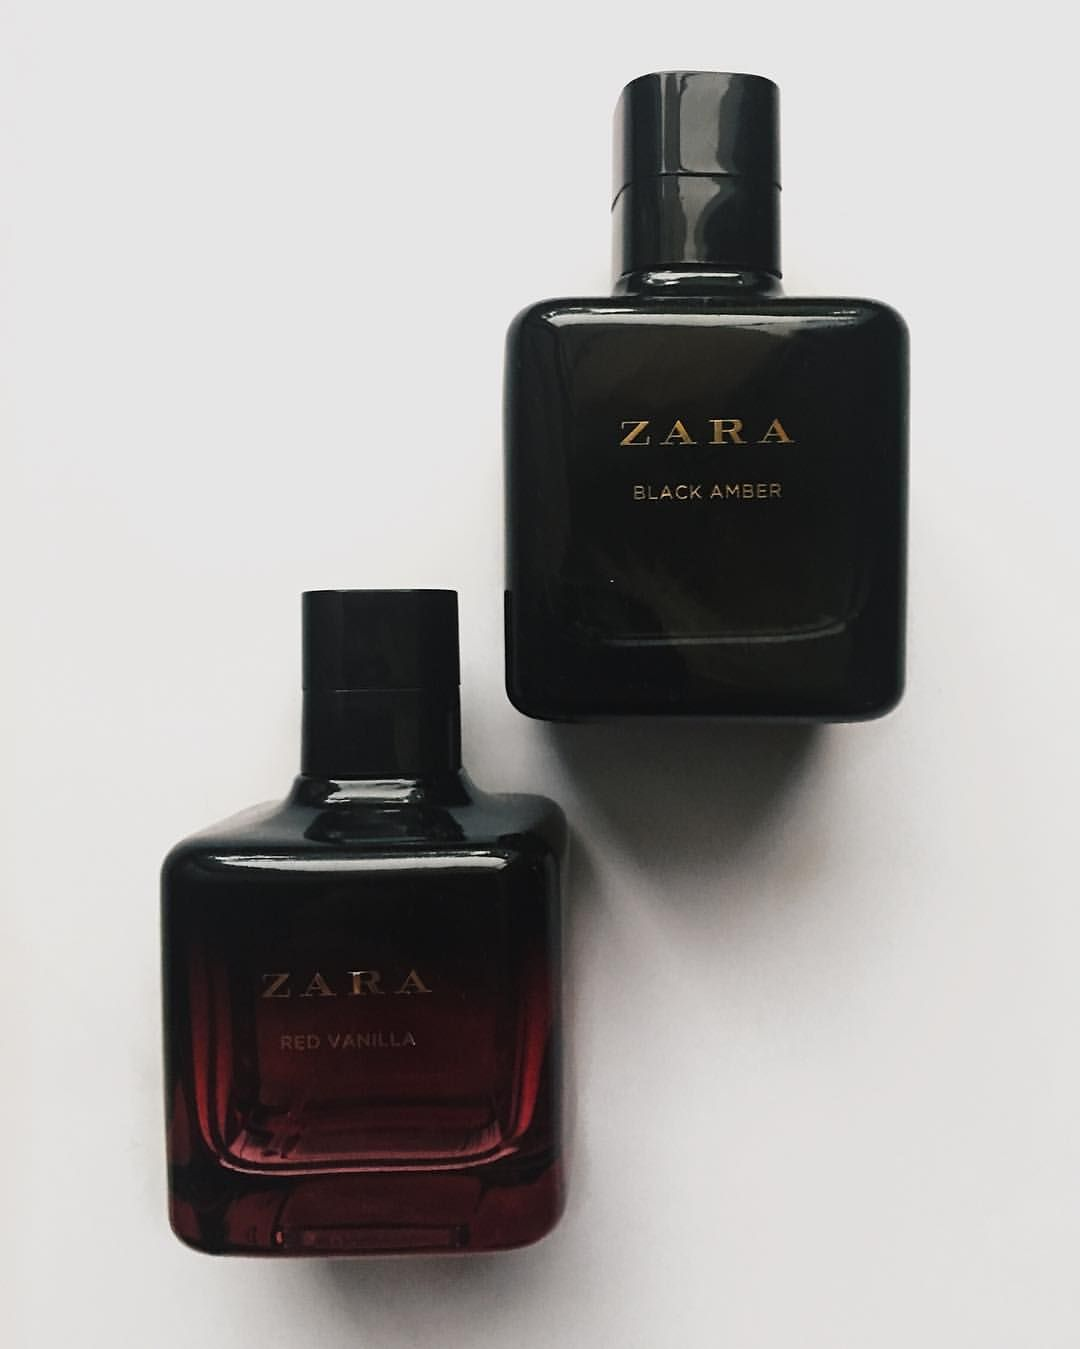 Perfumes Perfumeperfumezara My ✨what's Favorite Your 1cTlK3FJ